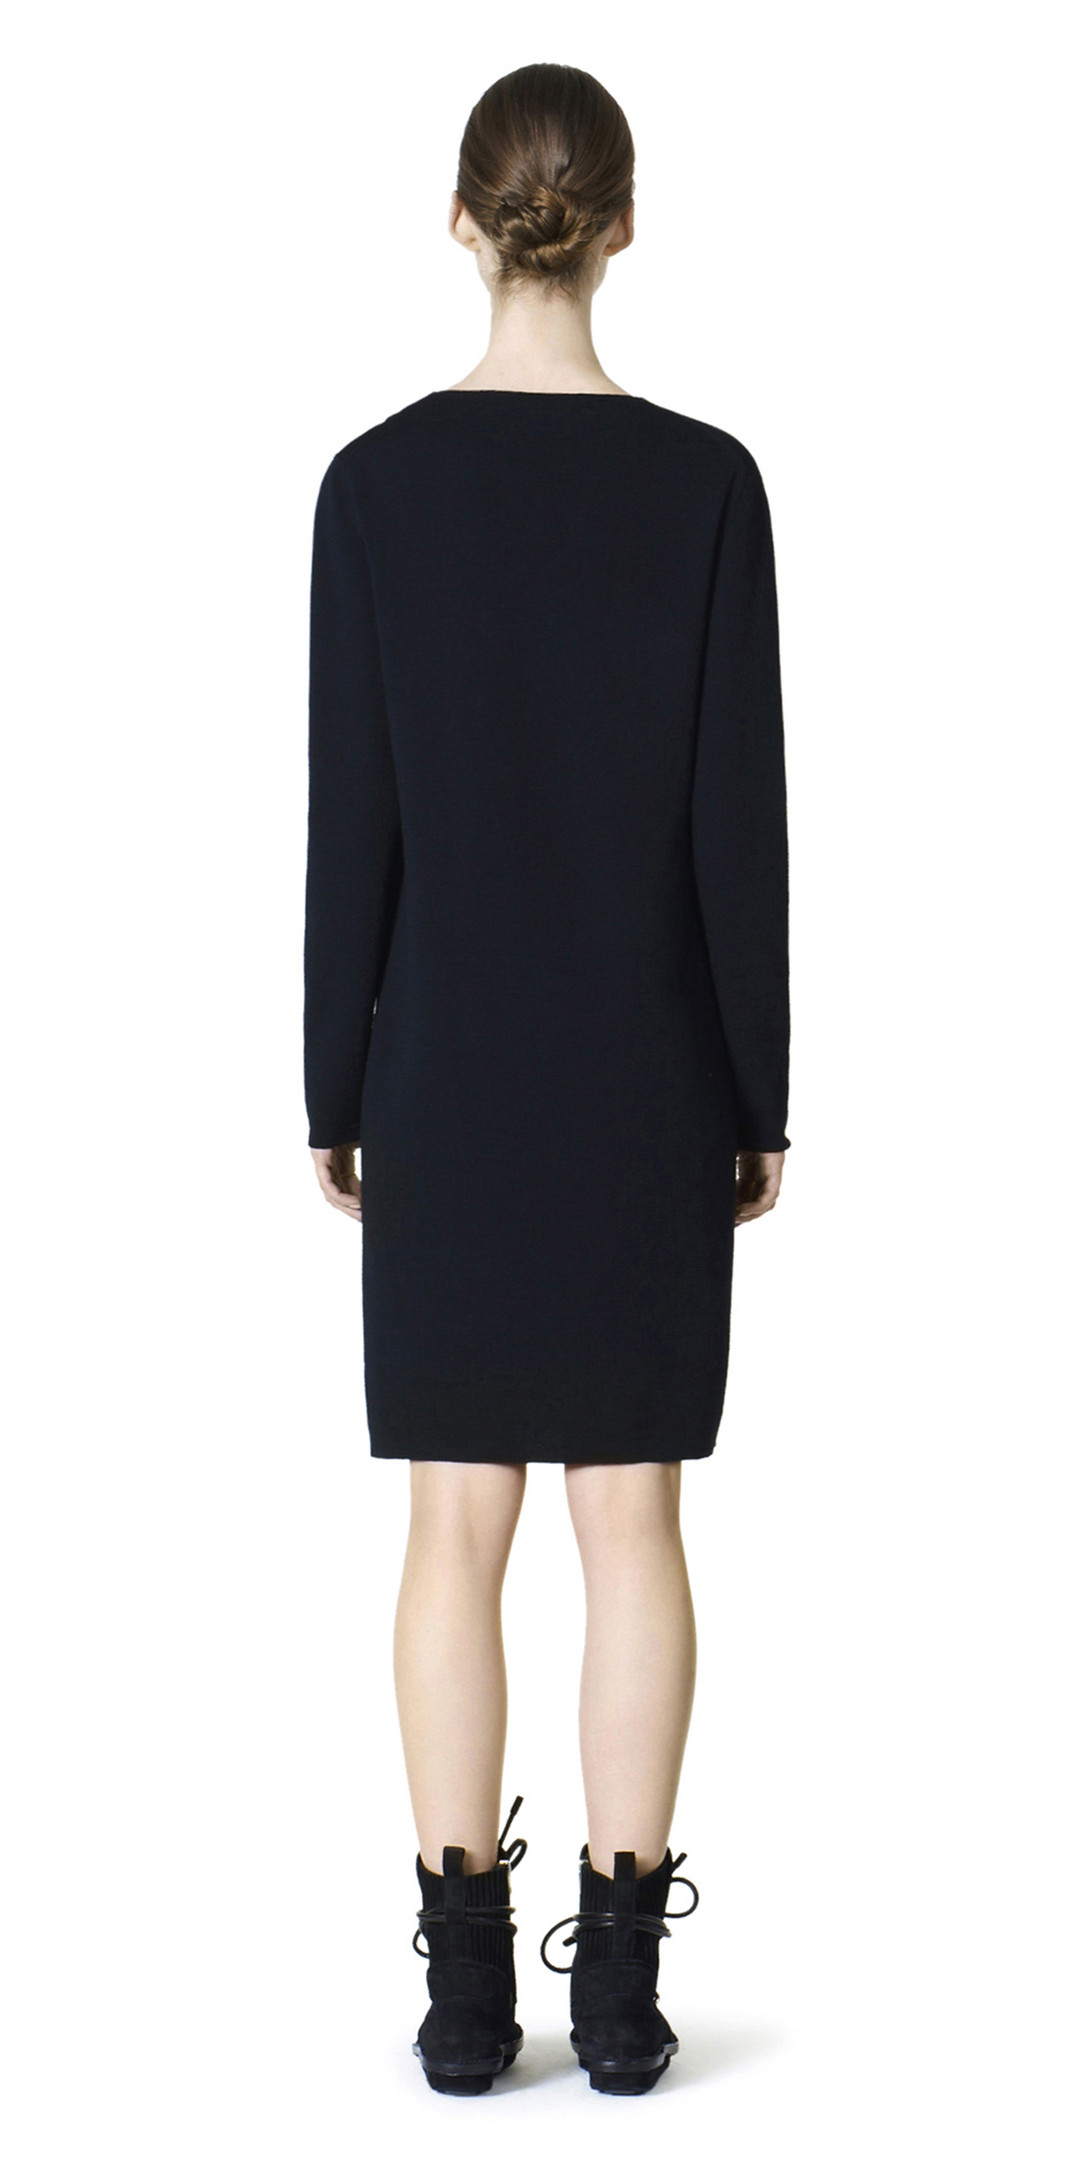 BALENCIAGA Dress D Balenciaga Milano V Dress i